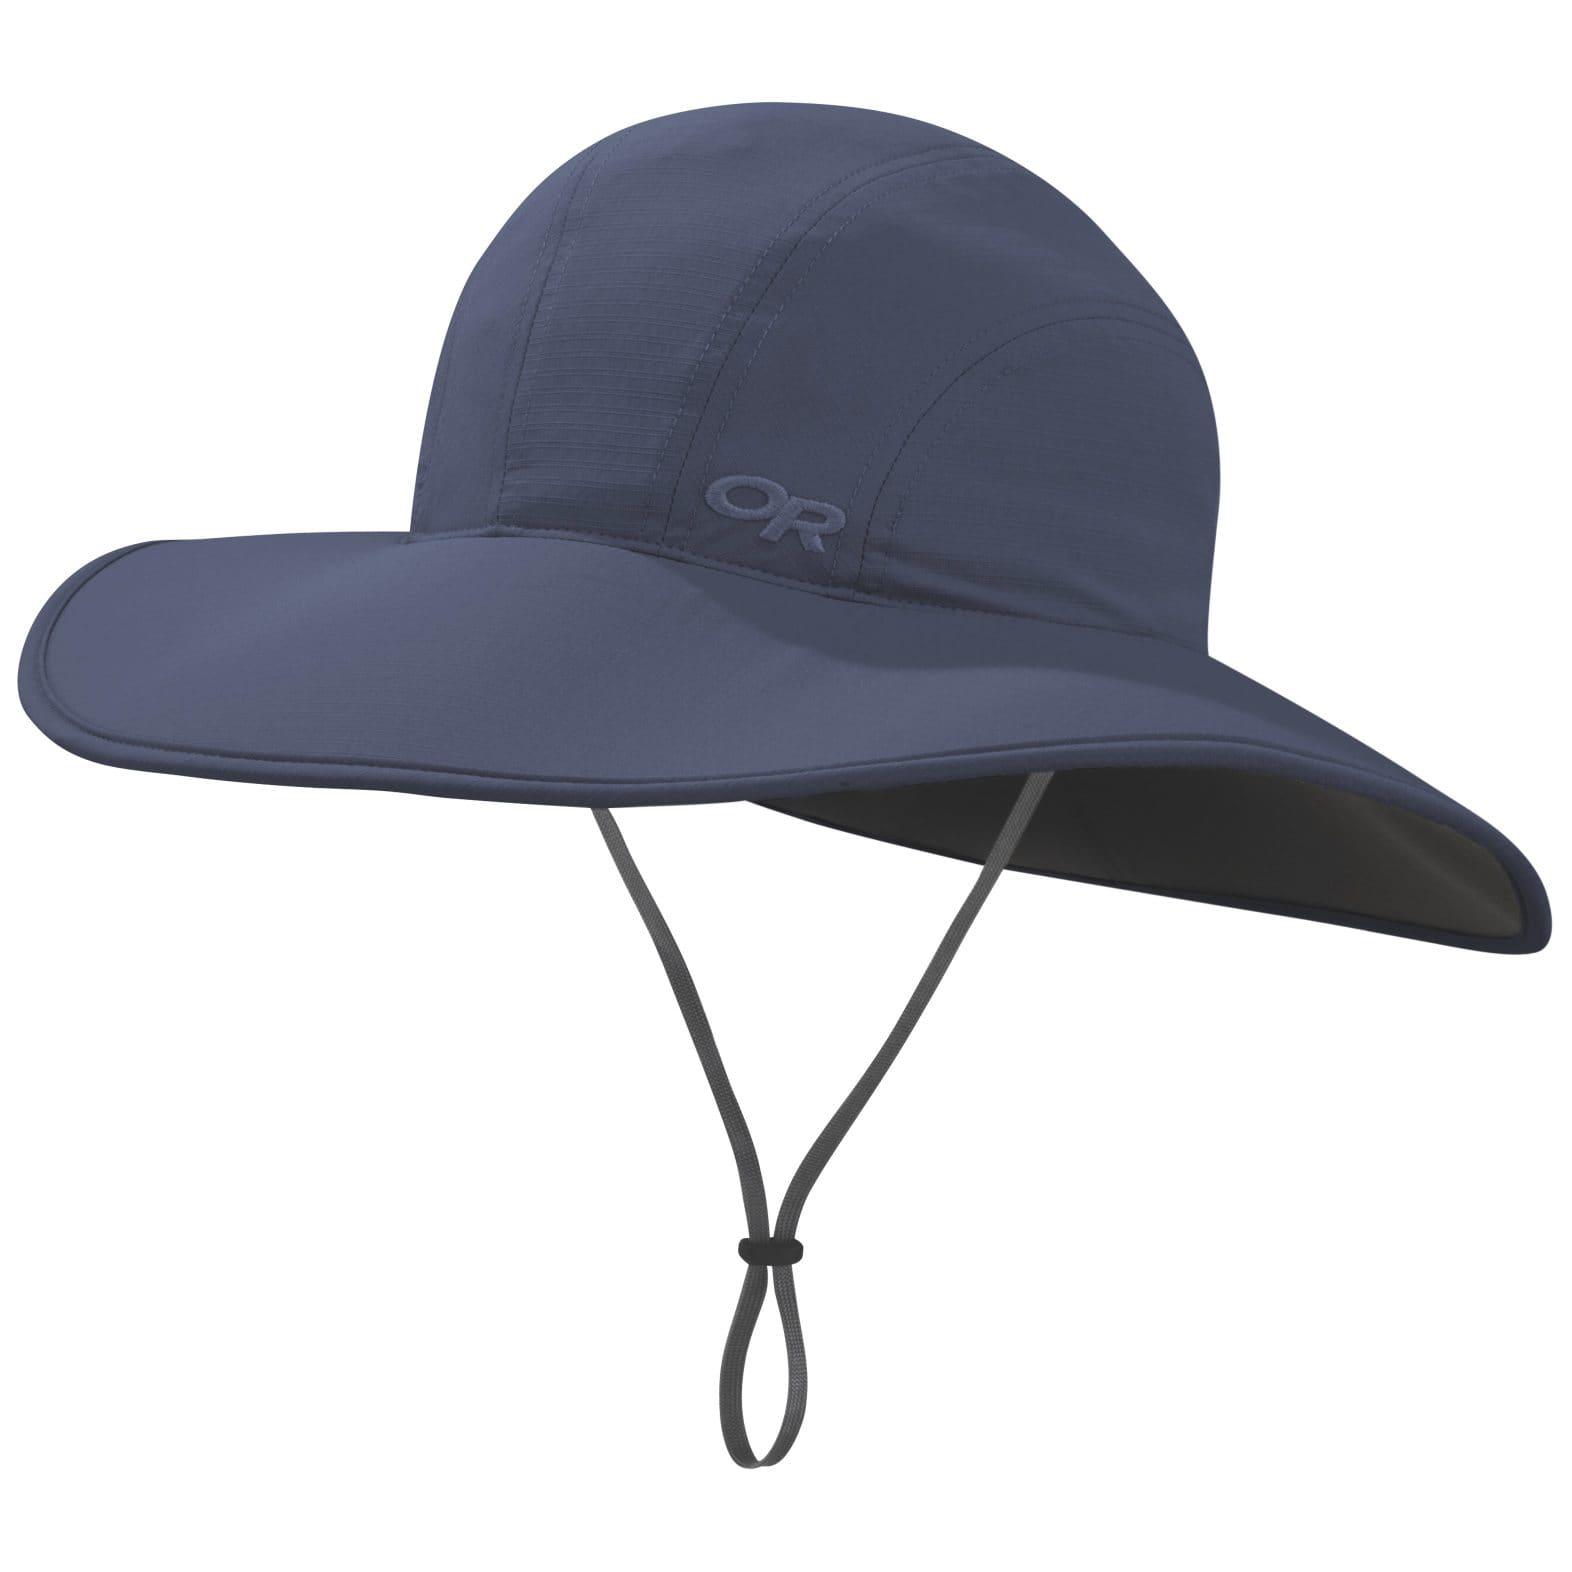 Outdoor Research-Oasis Sun Sombrero - Women's